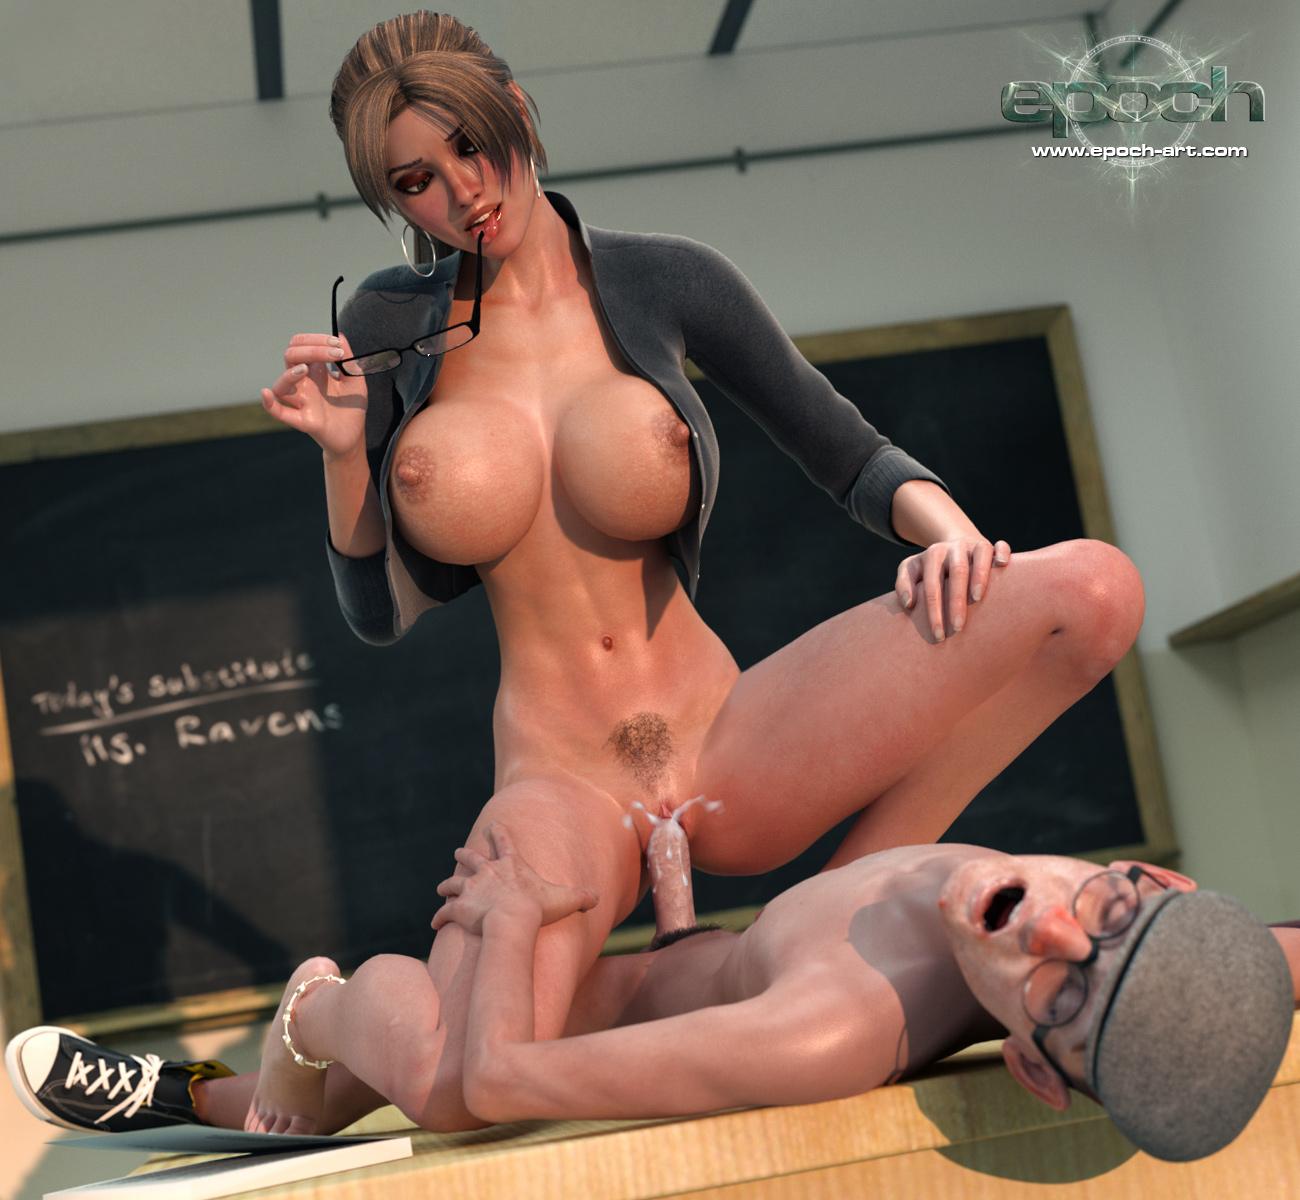 Babe today mc nudes clara g original blonde porn xxx mobile porn pics